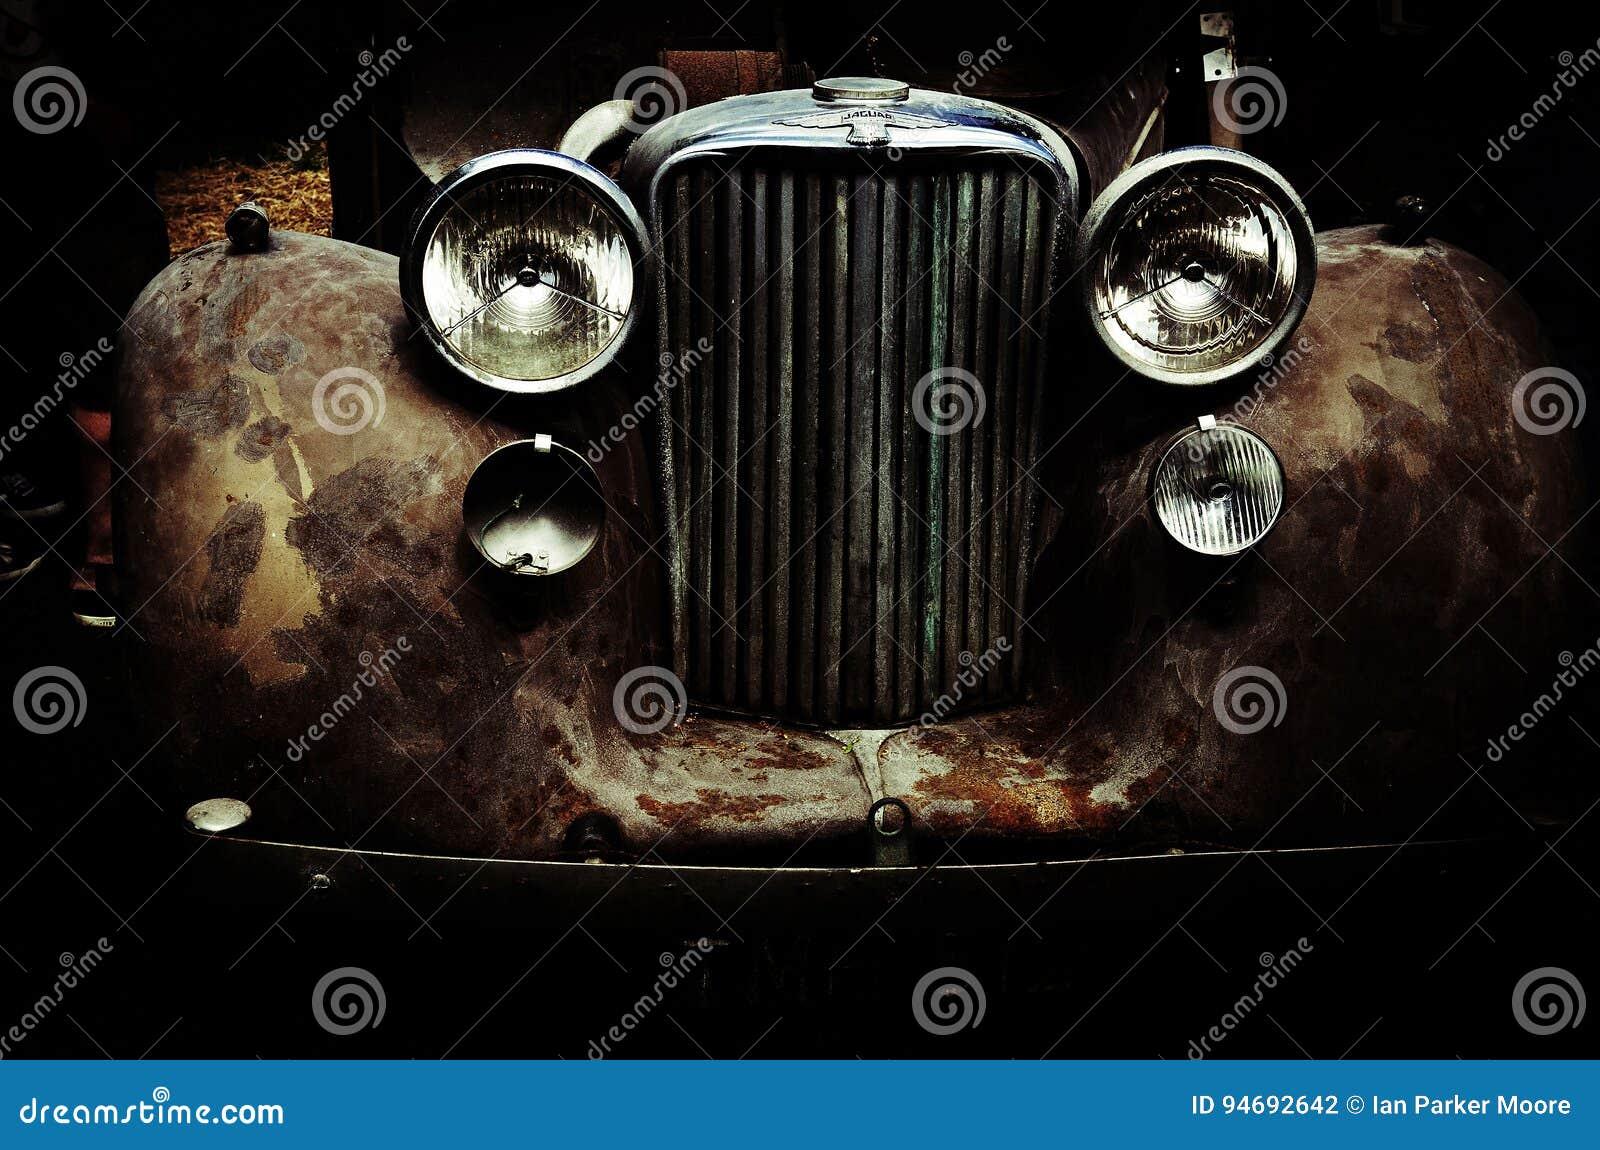 Ein Jaguar-Auto